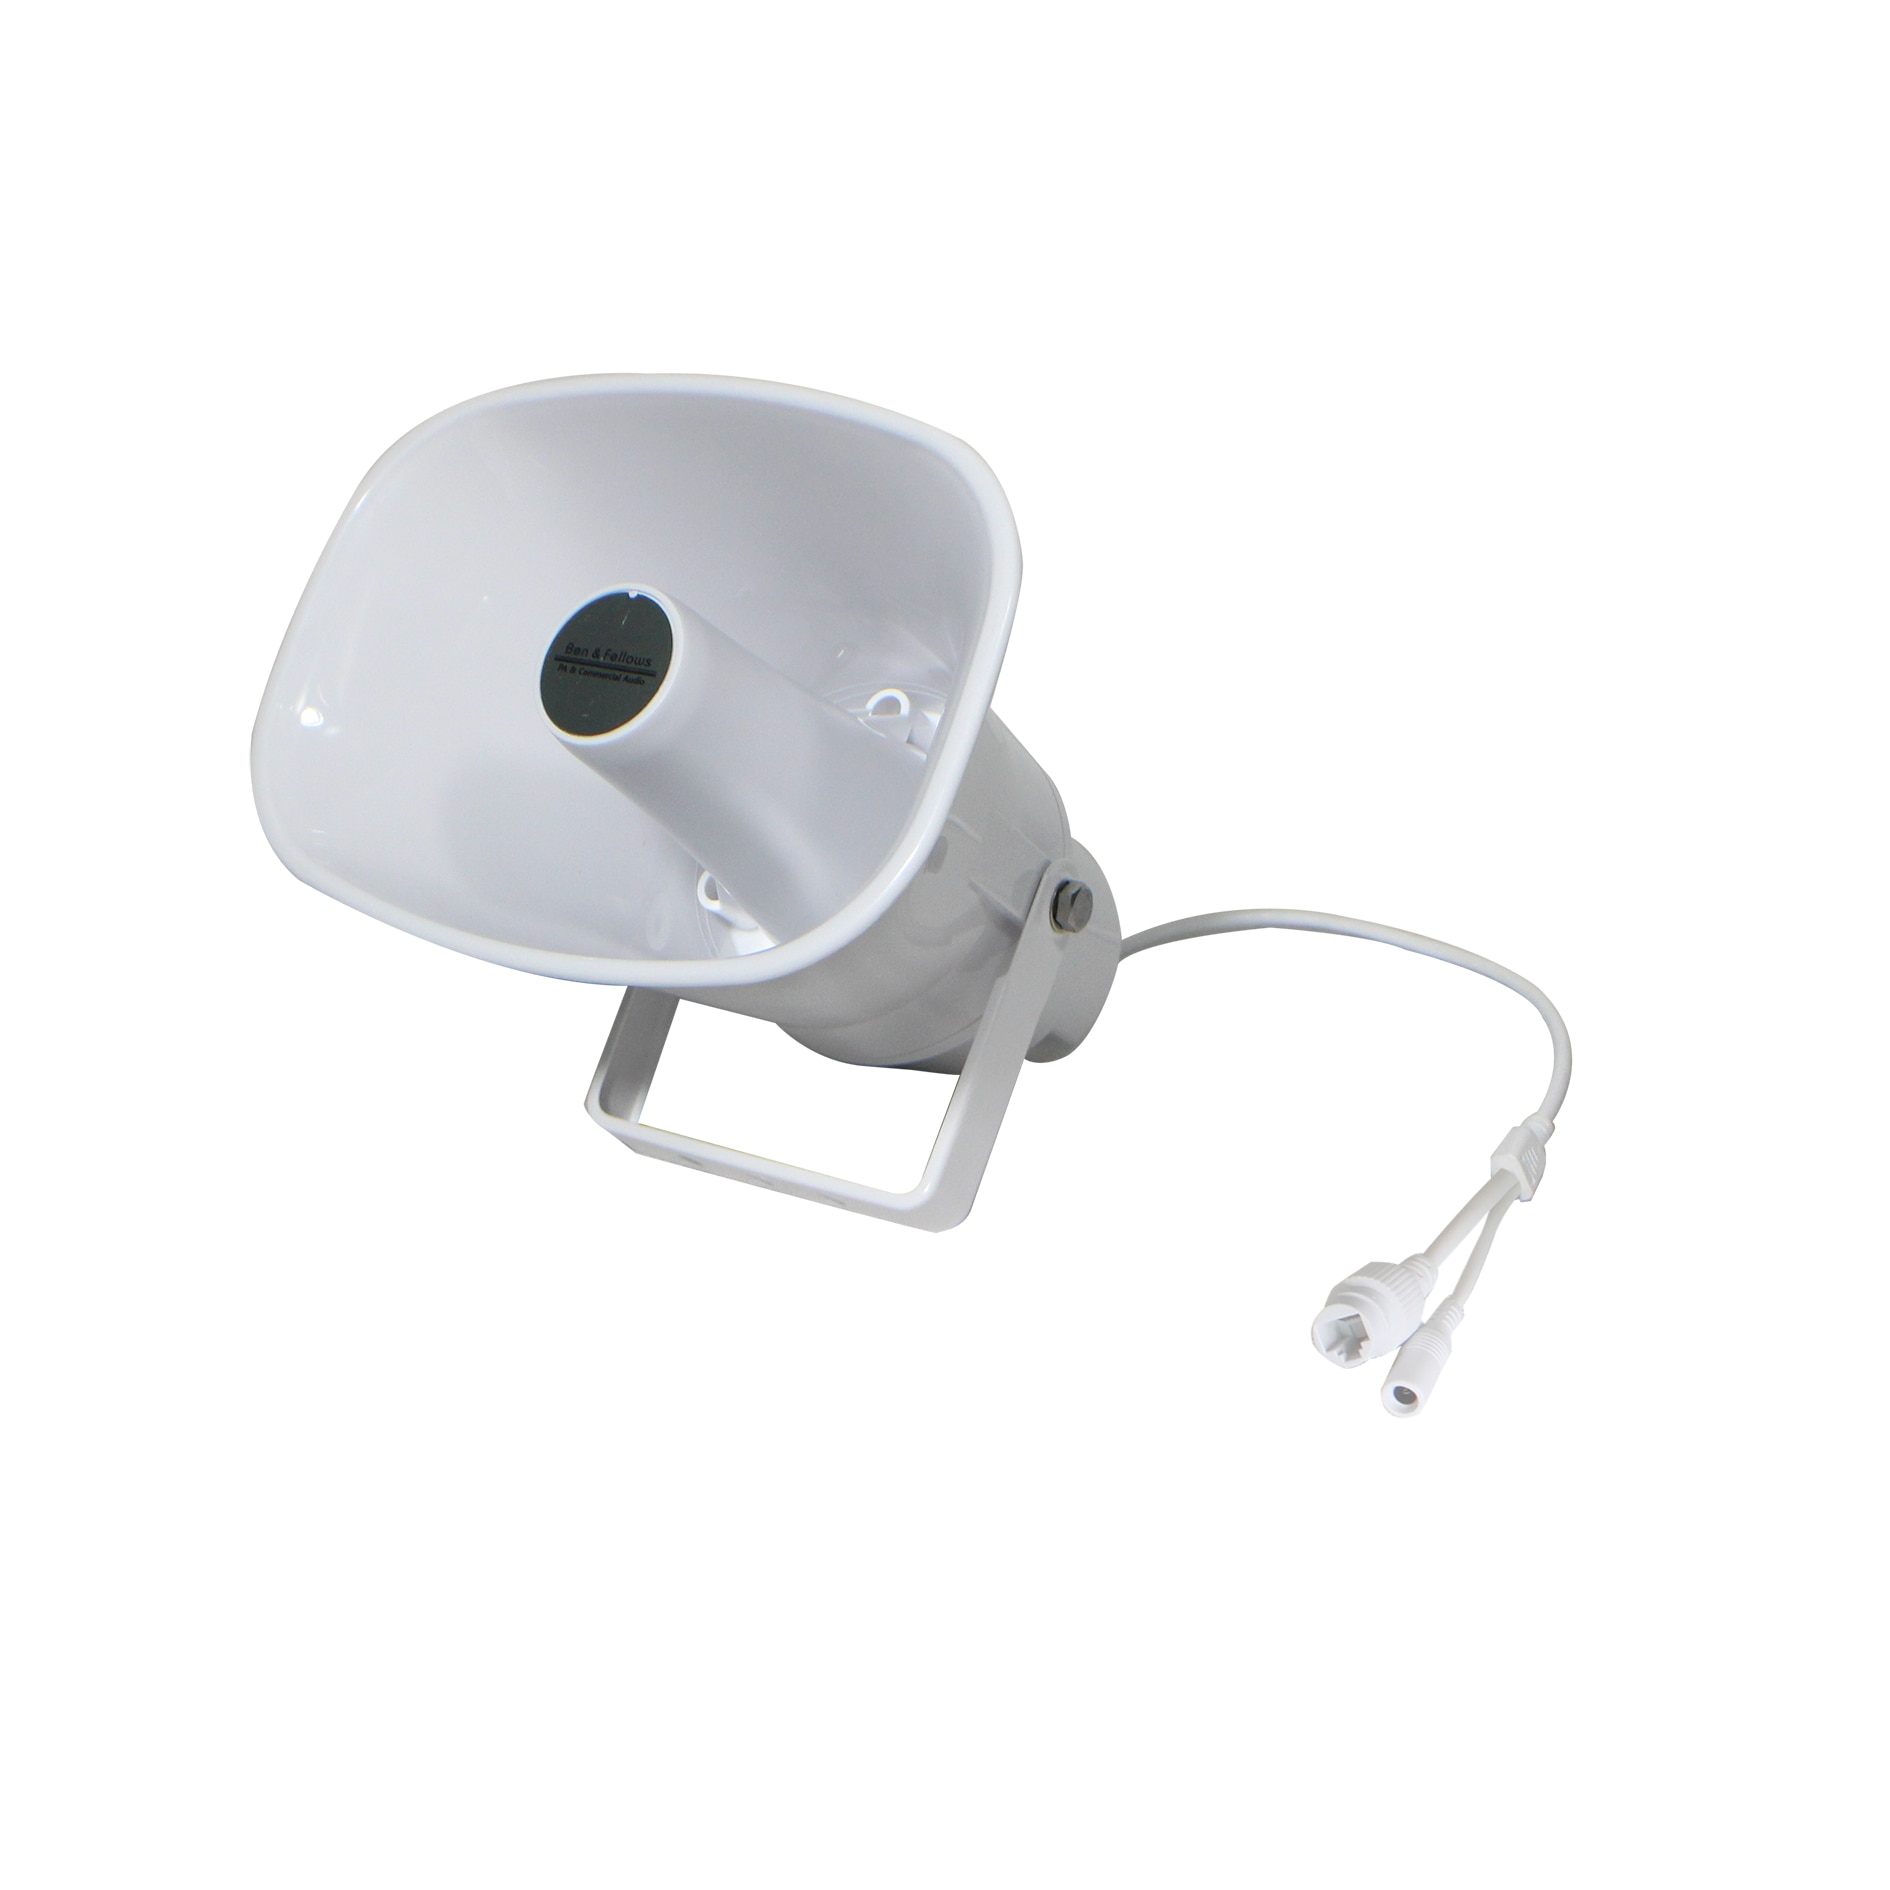 Ben & fellow-مكبر صوت بوق بيضاوي مقاوم للماء ، شبكة IP 511015 ، طاقة 30 وات ، داخلي أو خارجي